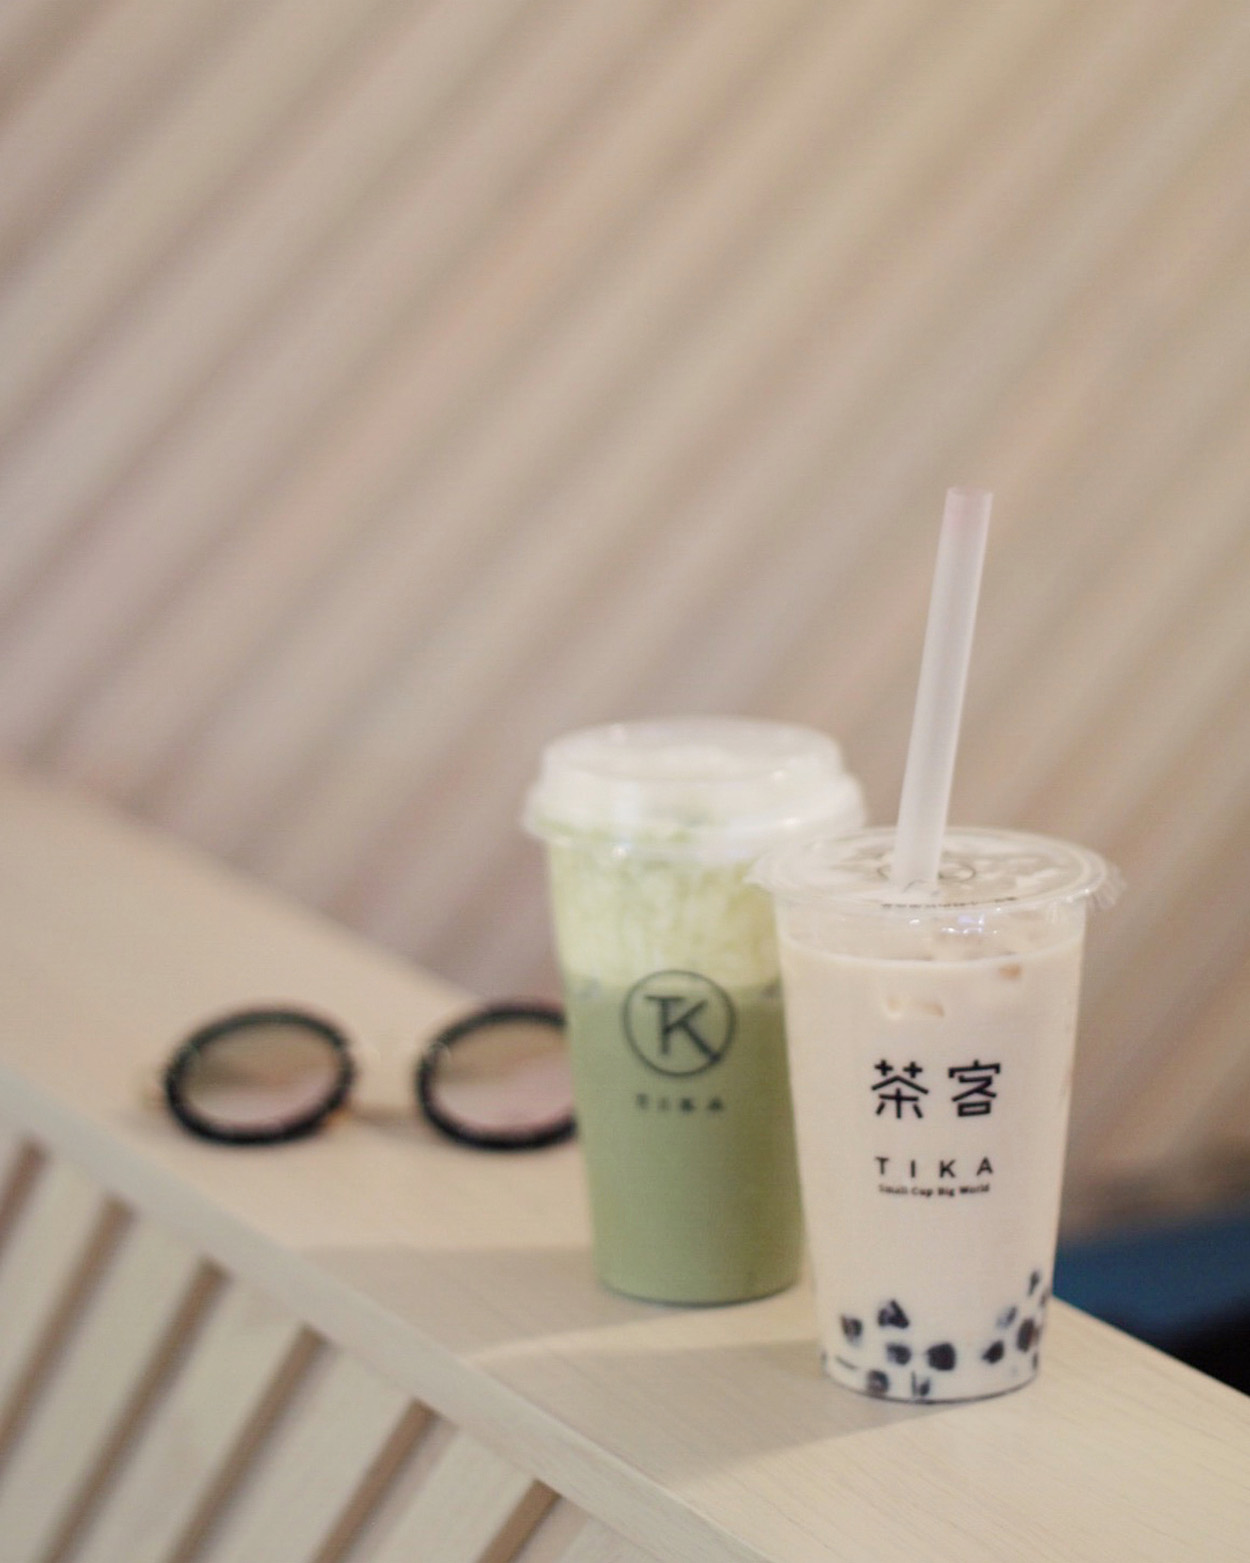 Bubble tea at Tika Tea House in Toronto